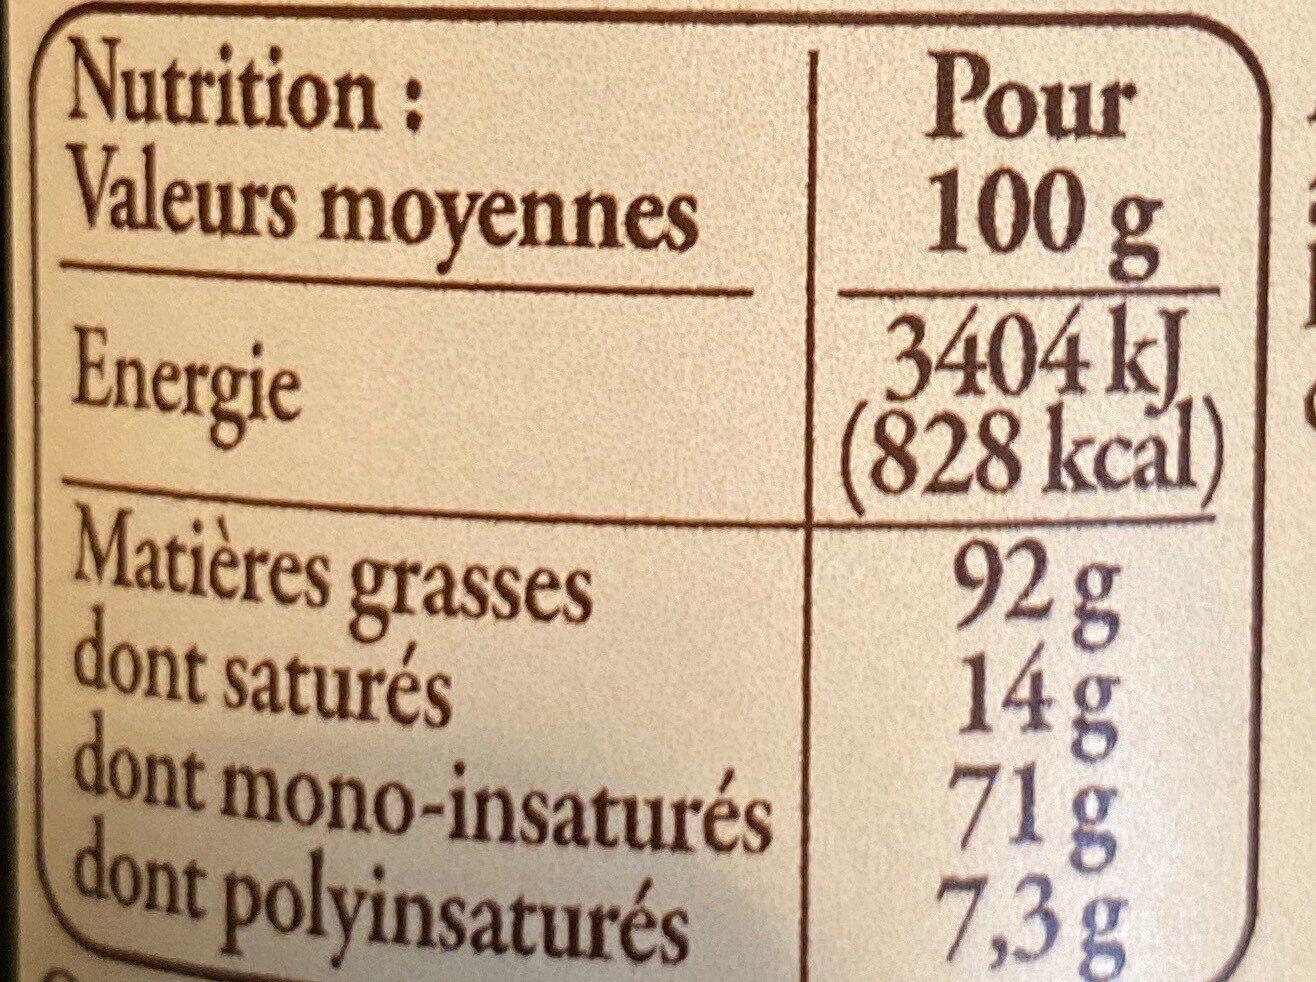 Huile d'olive AOC - Informations nutritionnelles - fr